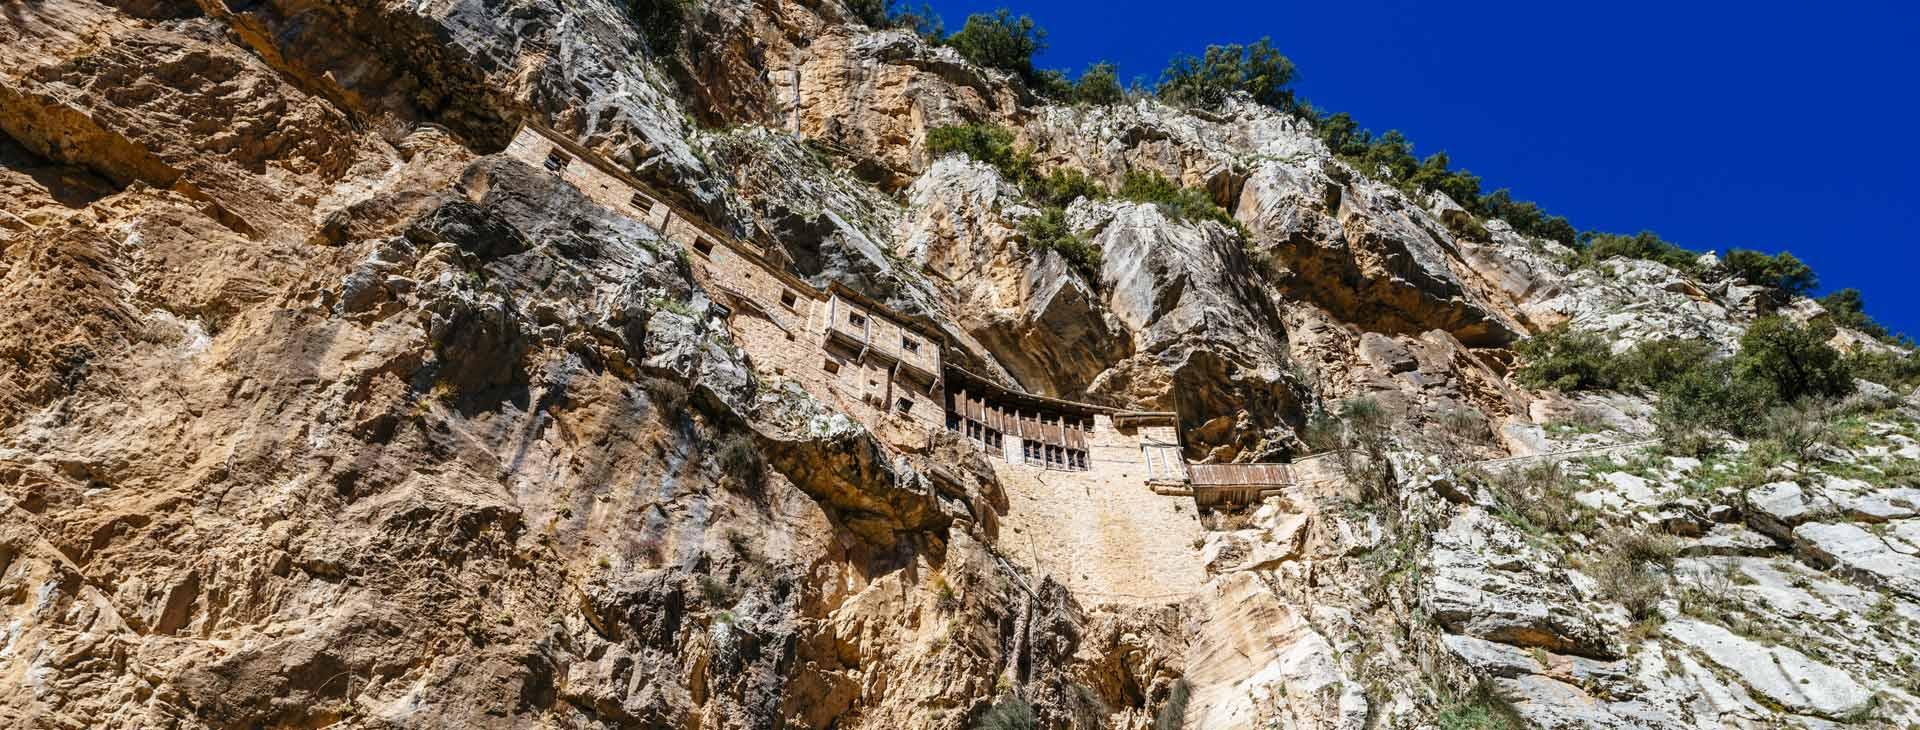 Monastery of Kipina, Ioannina